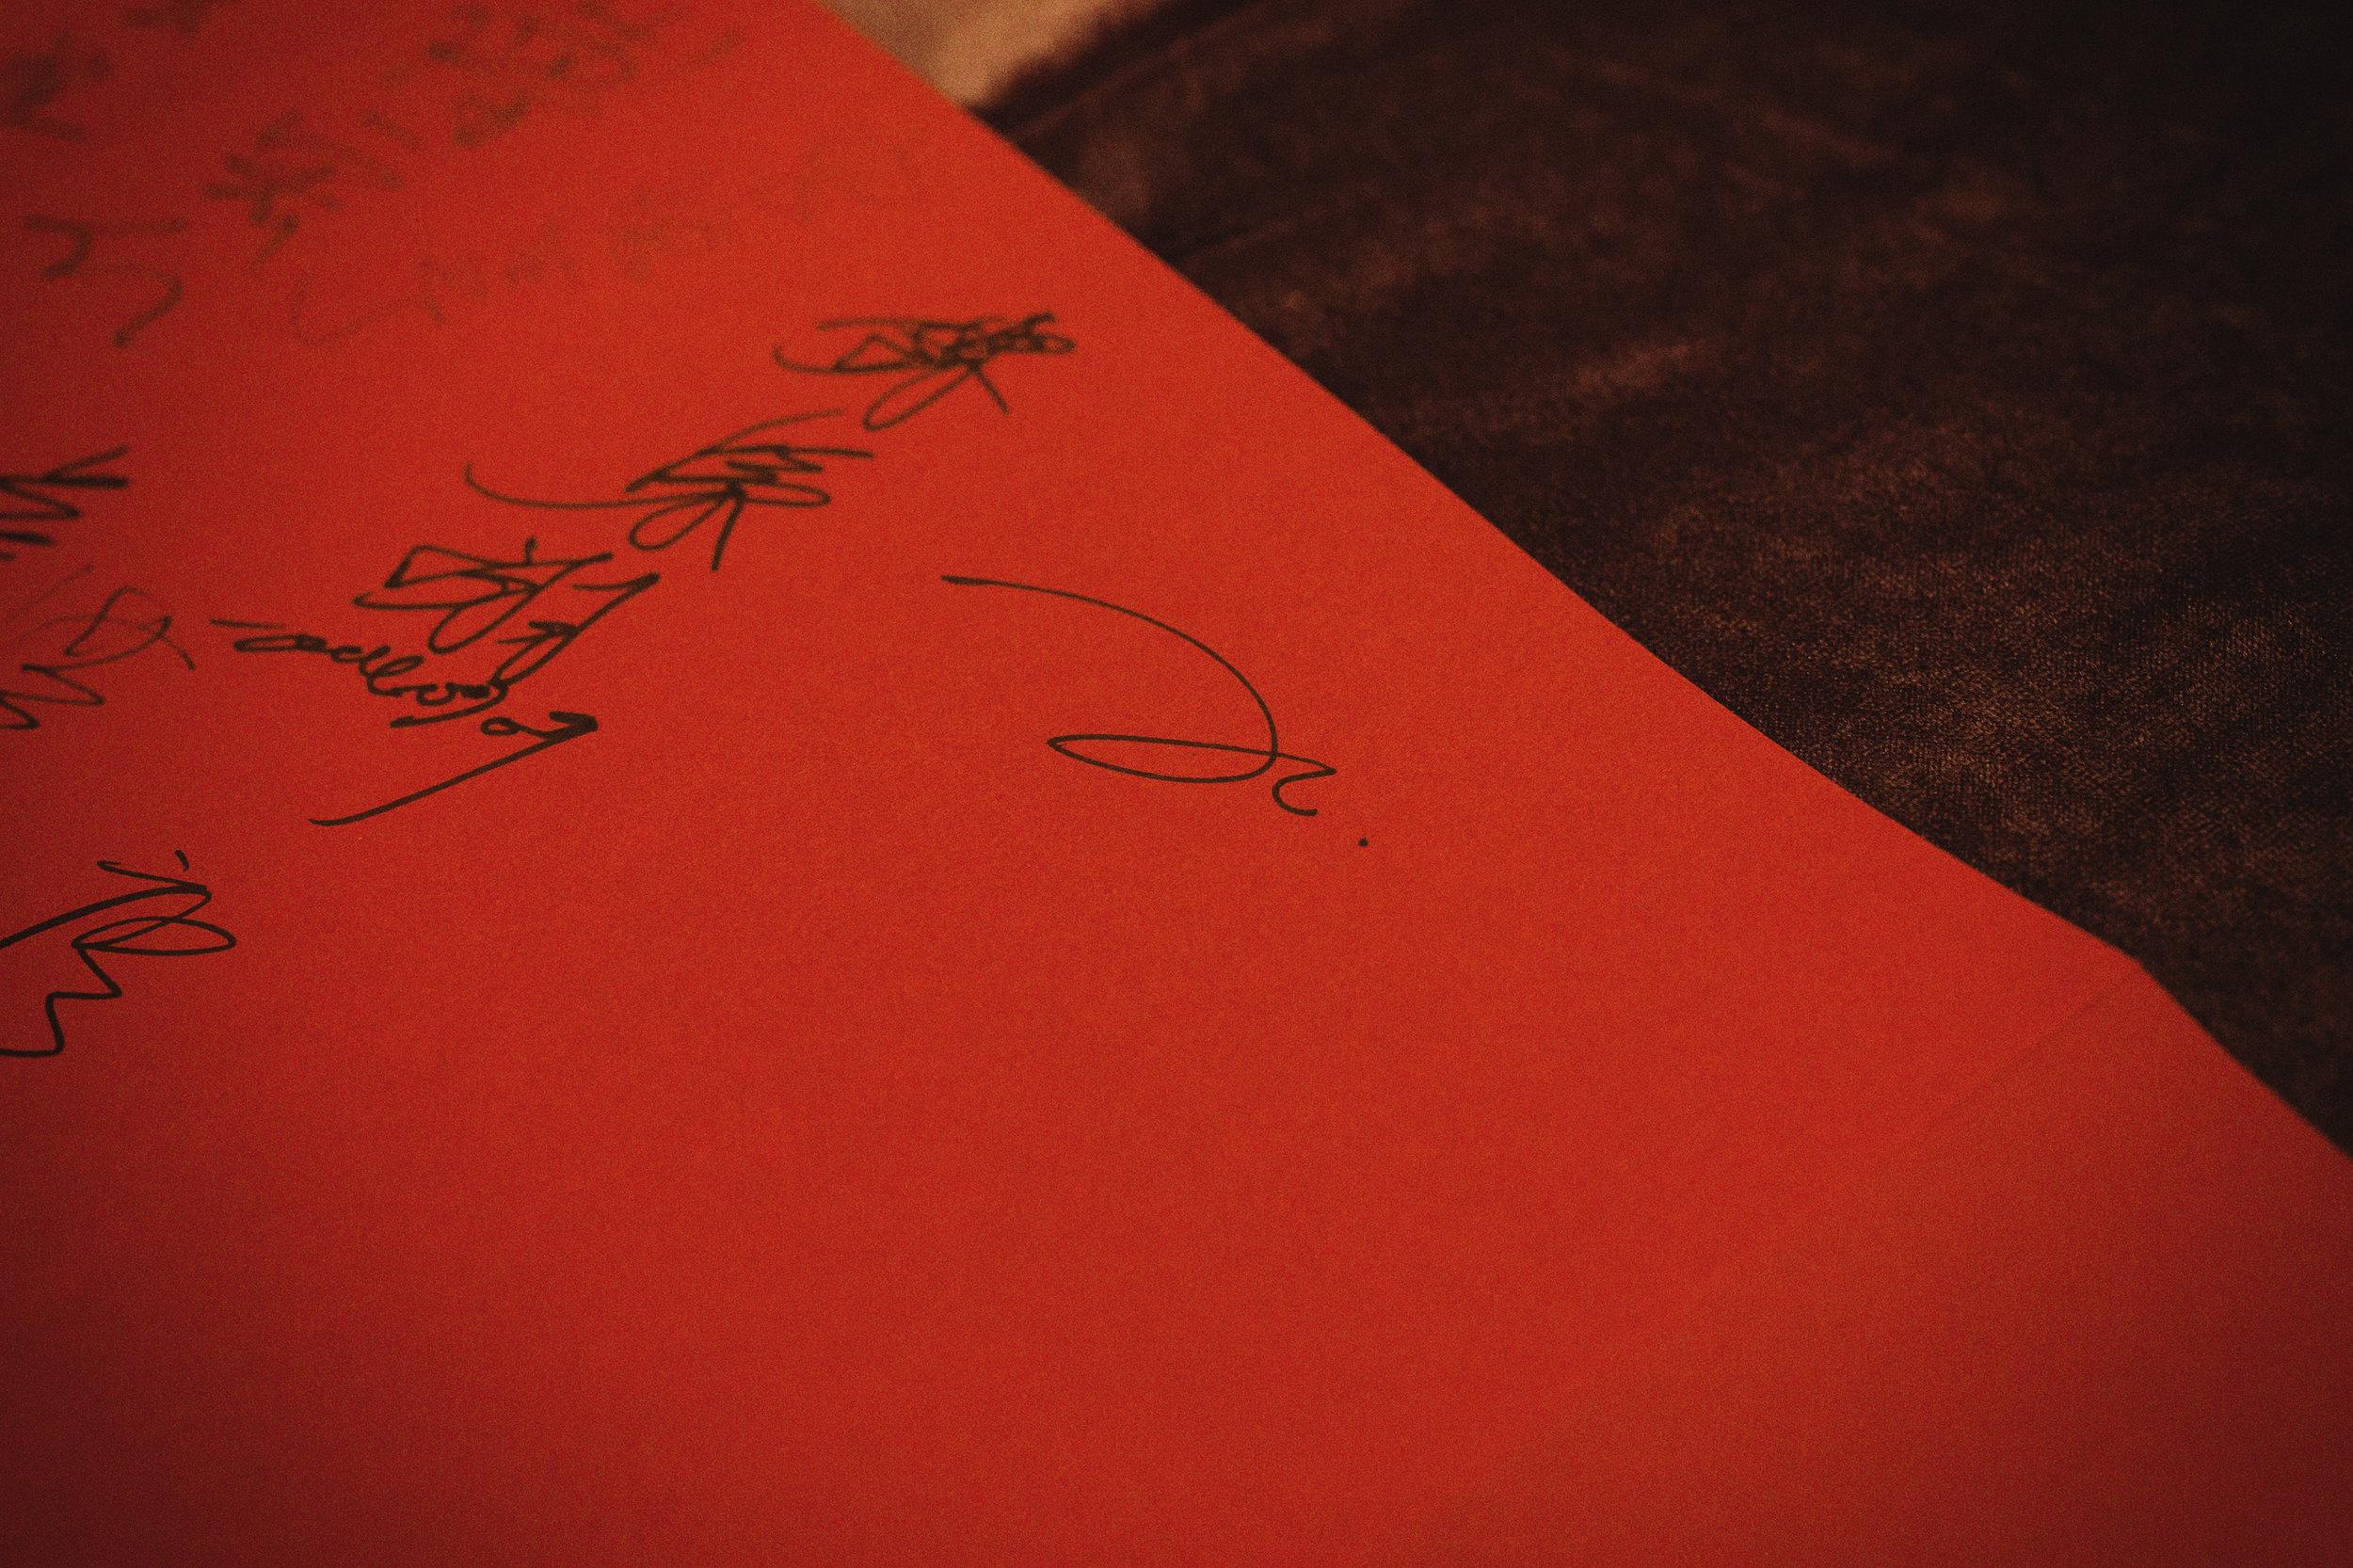 [JC]CREATIVE 女性攝影師 北投儷宴會館 補請台灣WEDDING    自然風格 台北婚攝推 女婚攝  桃園婚攝   圖像00194.JPG